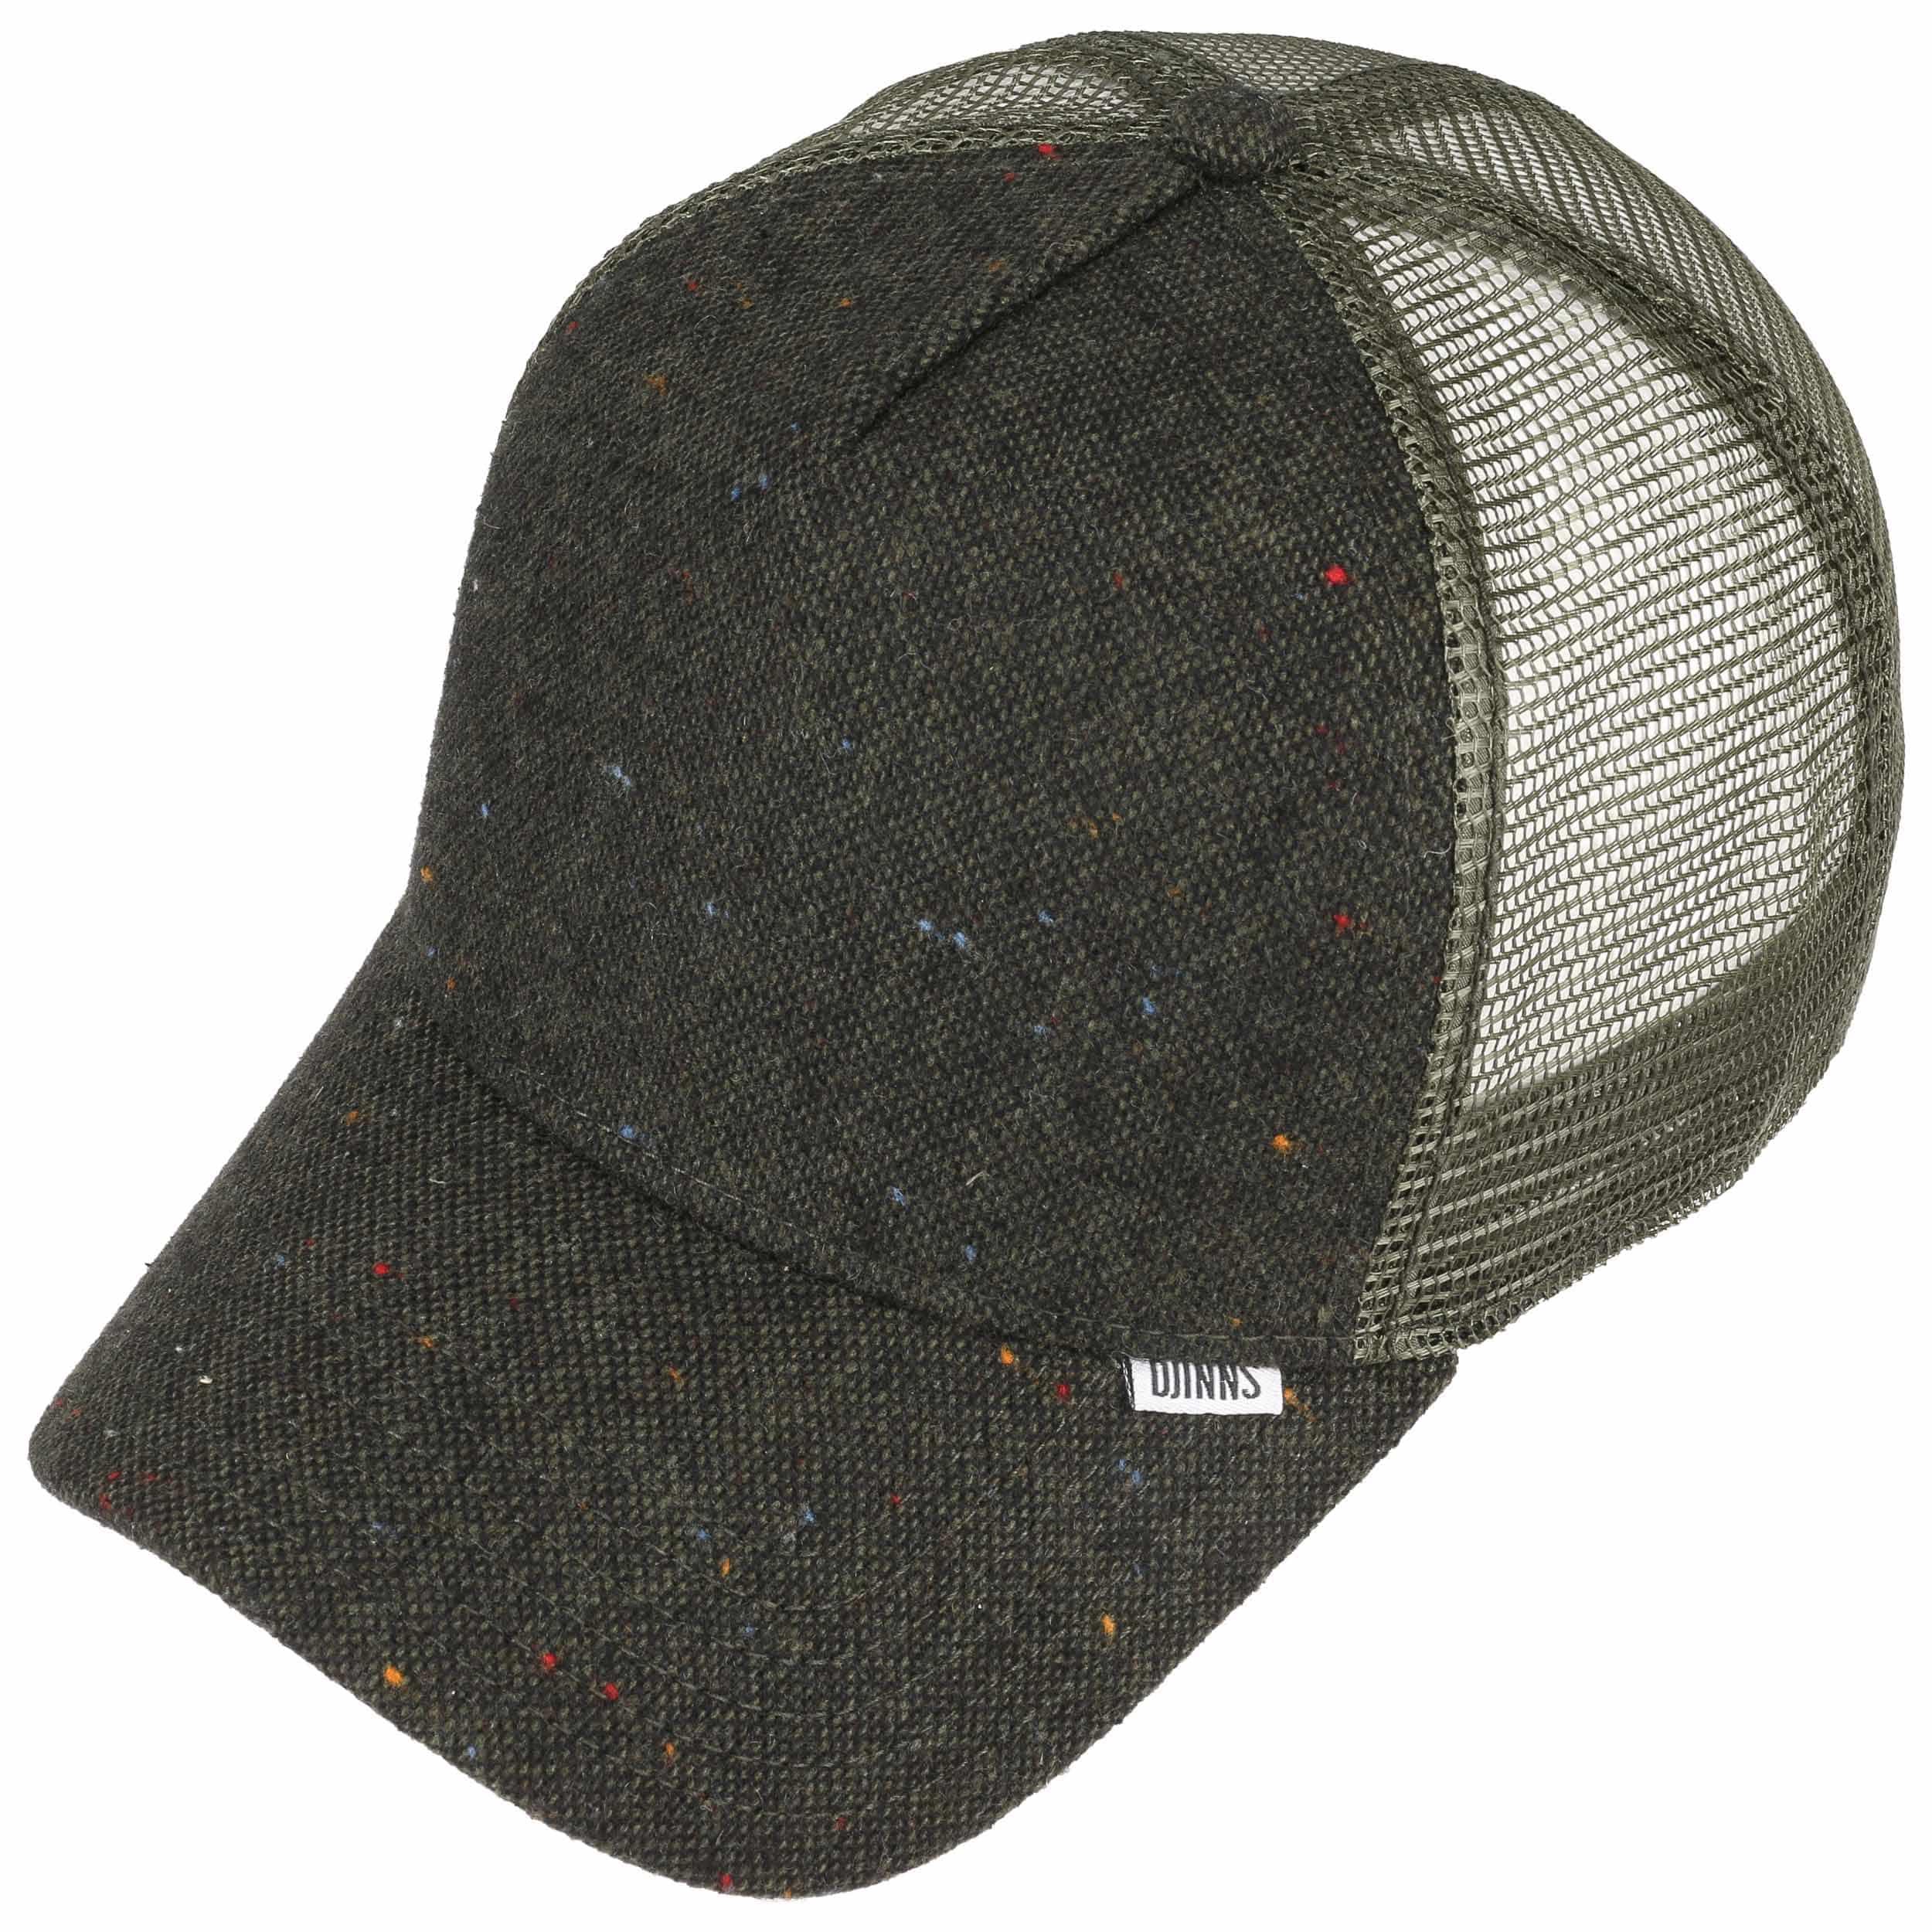 felt rubber hft trucker cap by djinns gbp 22 95 hats. Black Bedroom Furniture Sets. Home Design Ideas